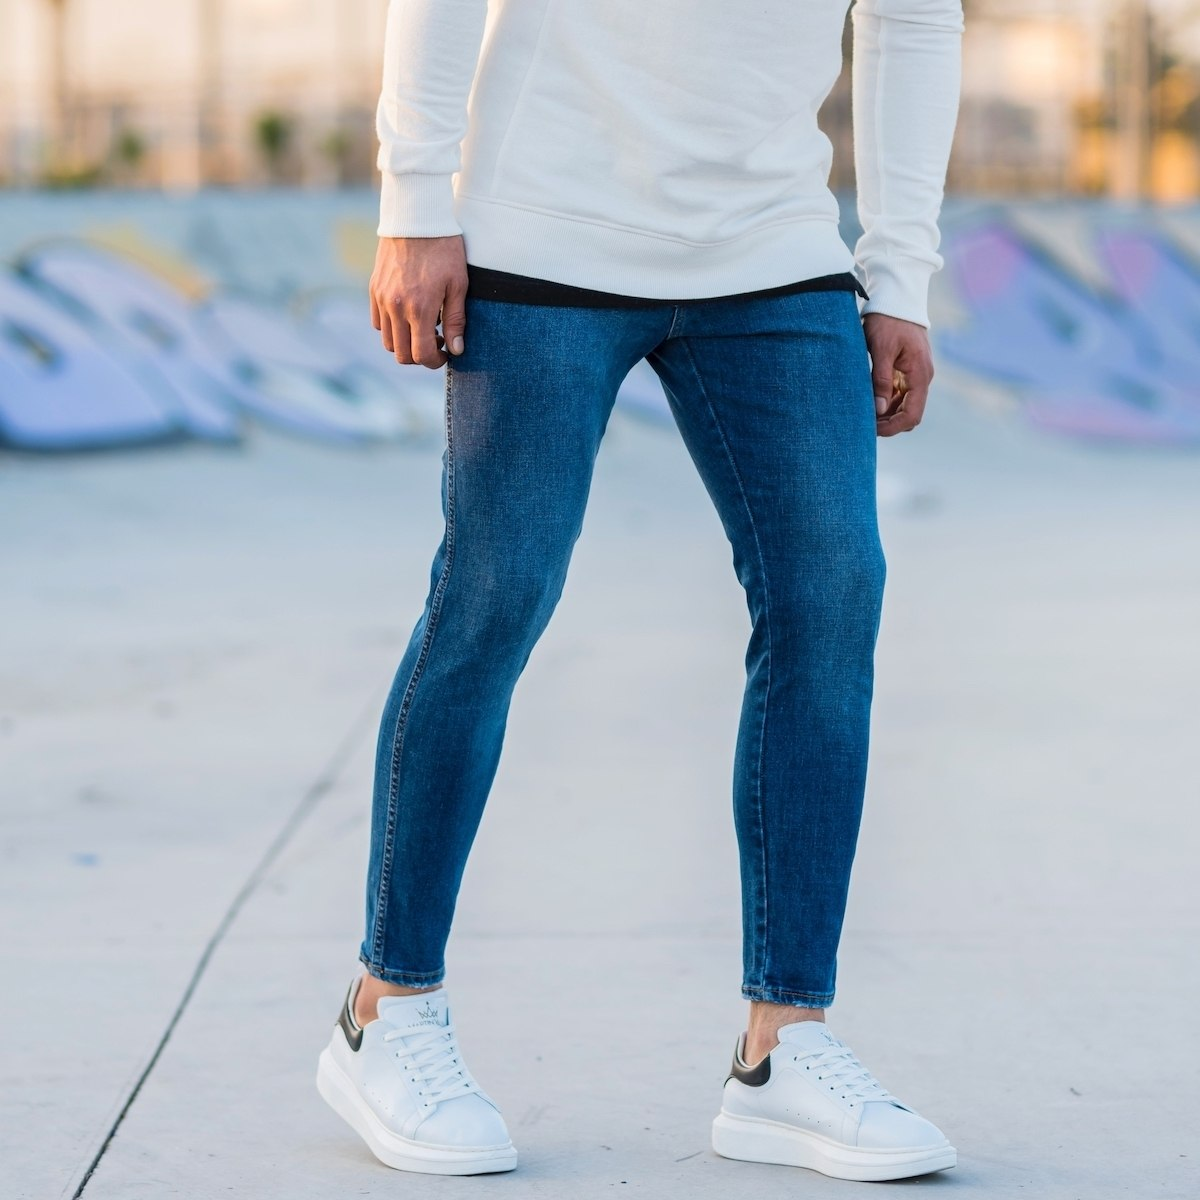 Men's Vintage Skinny Jeans...